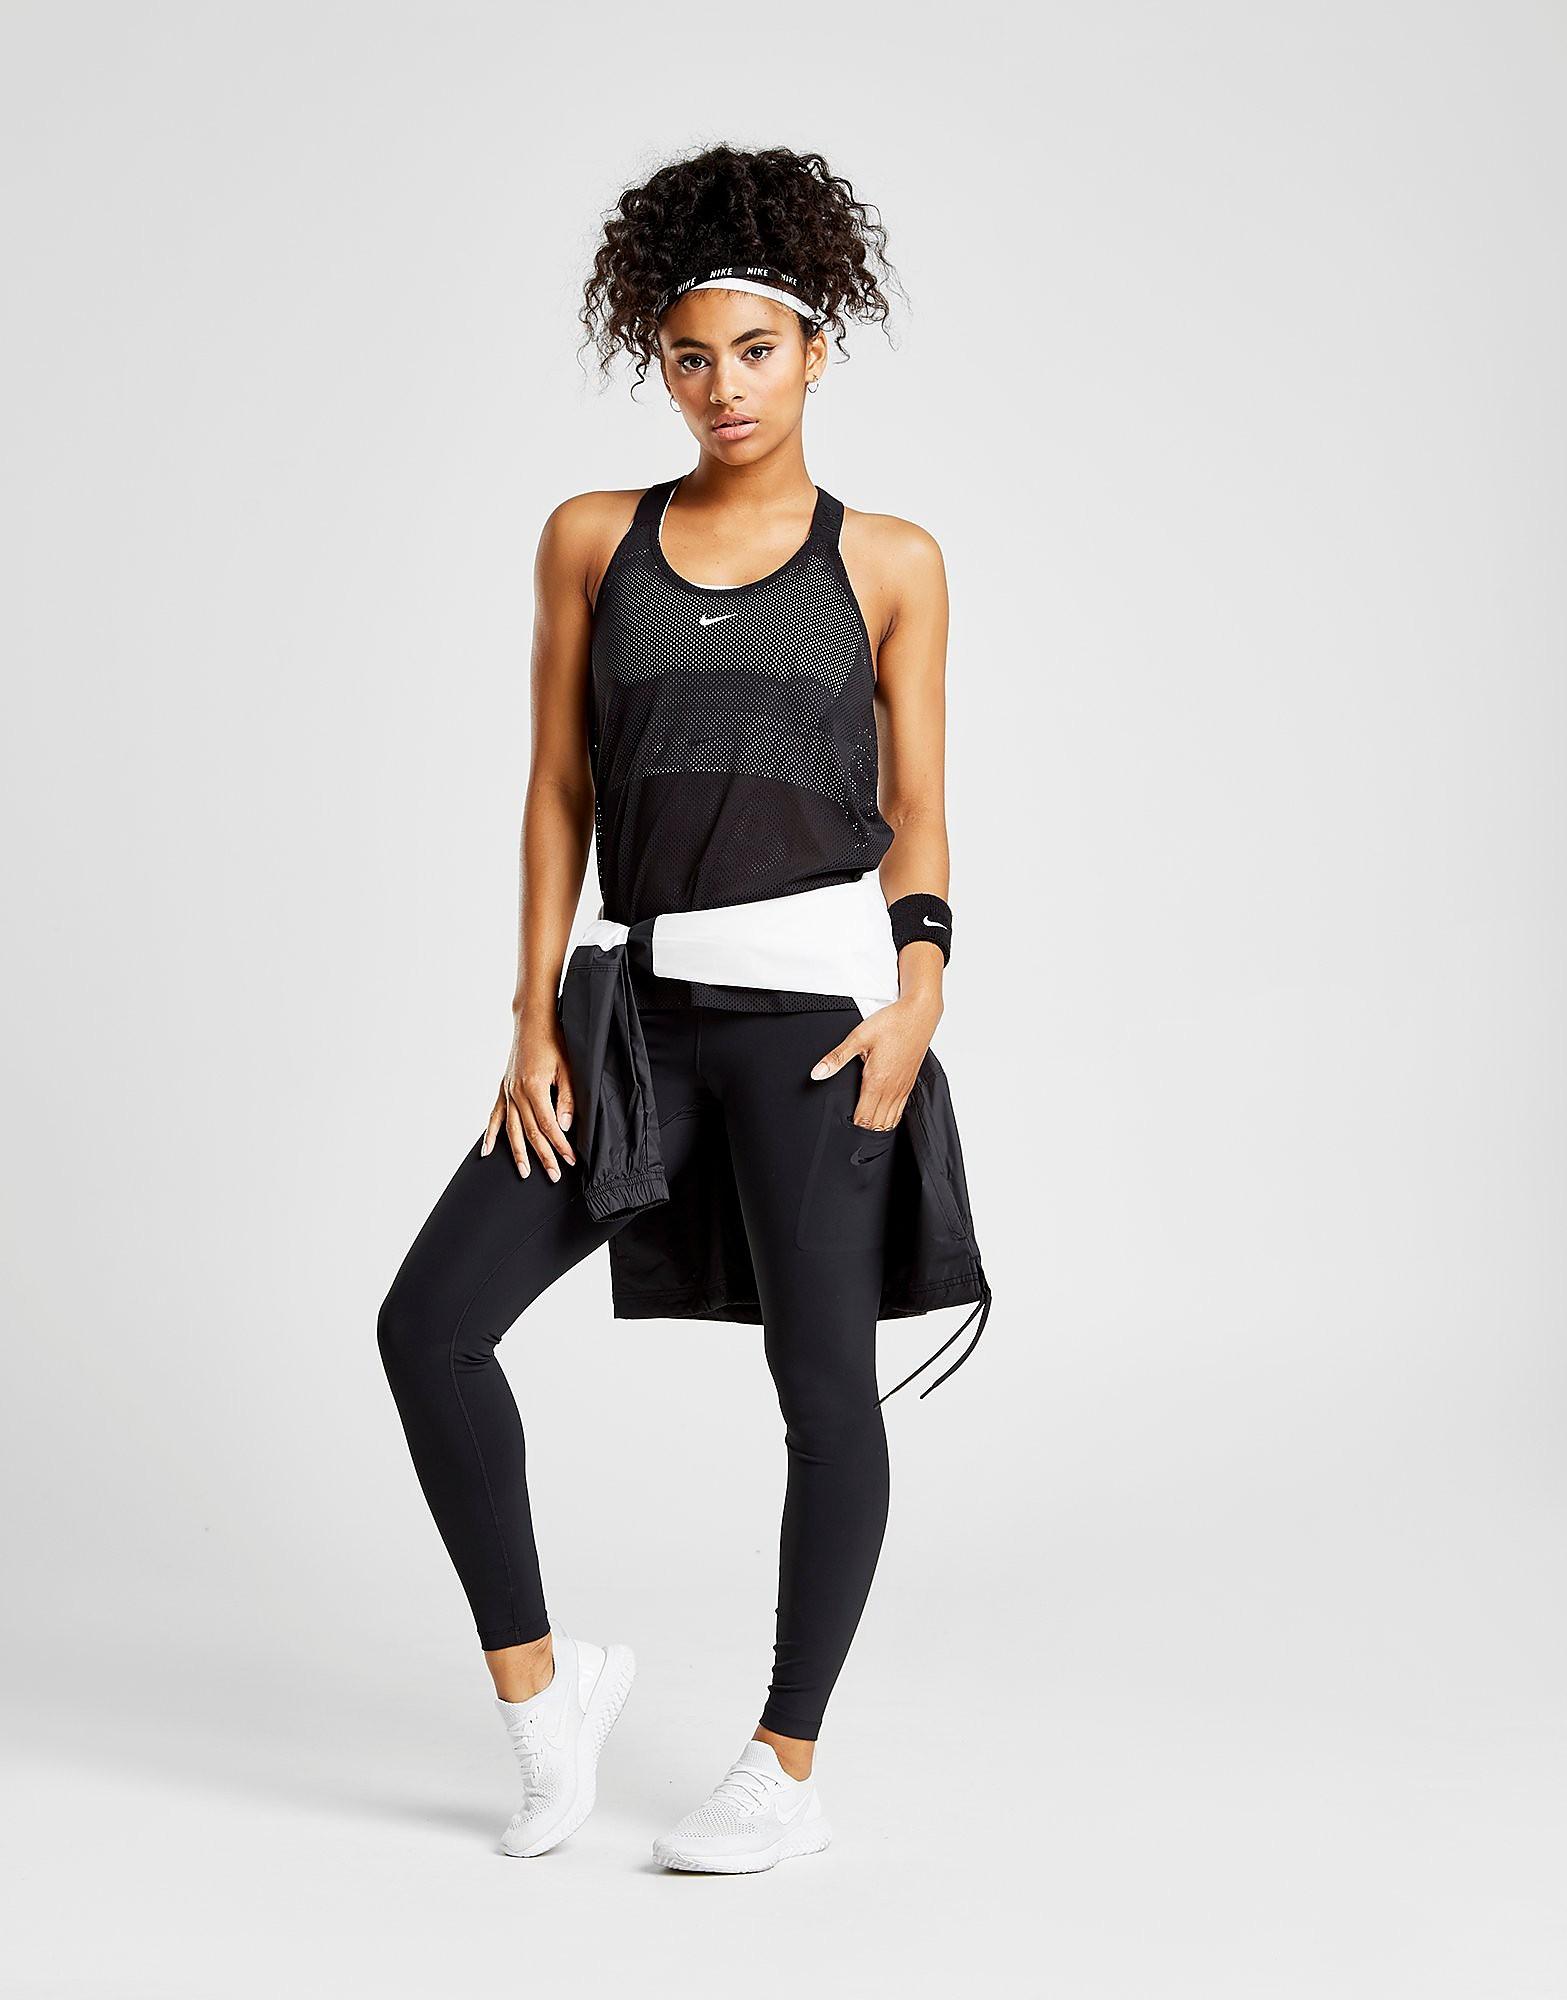 Nike Collants Power